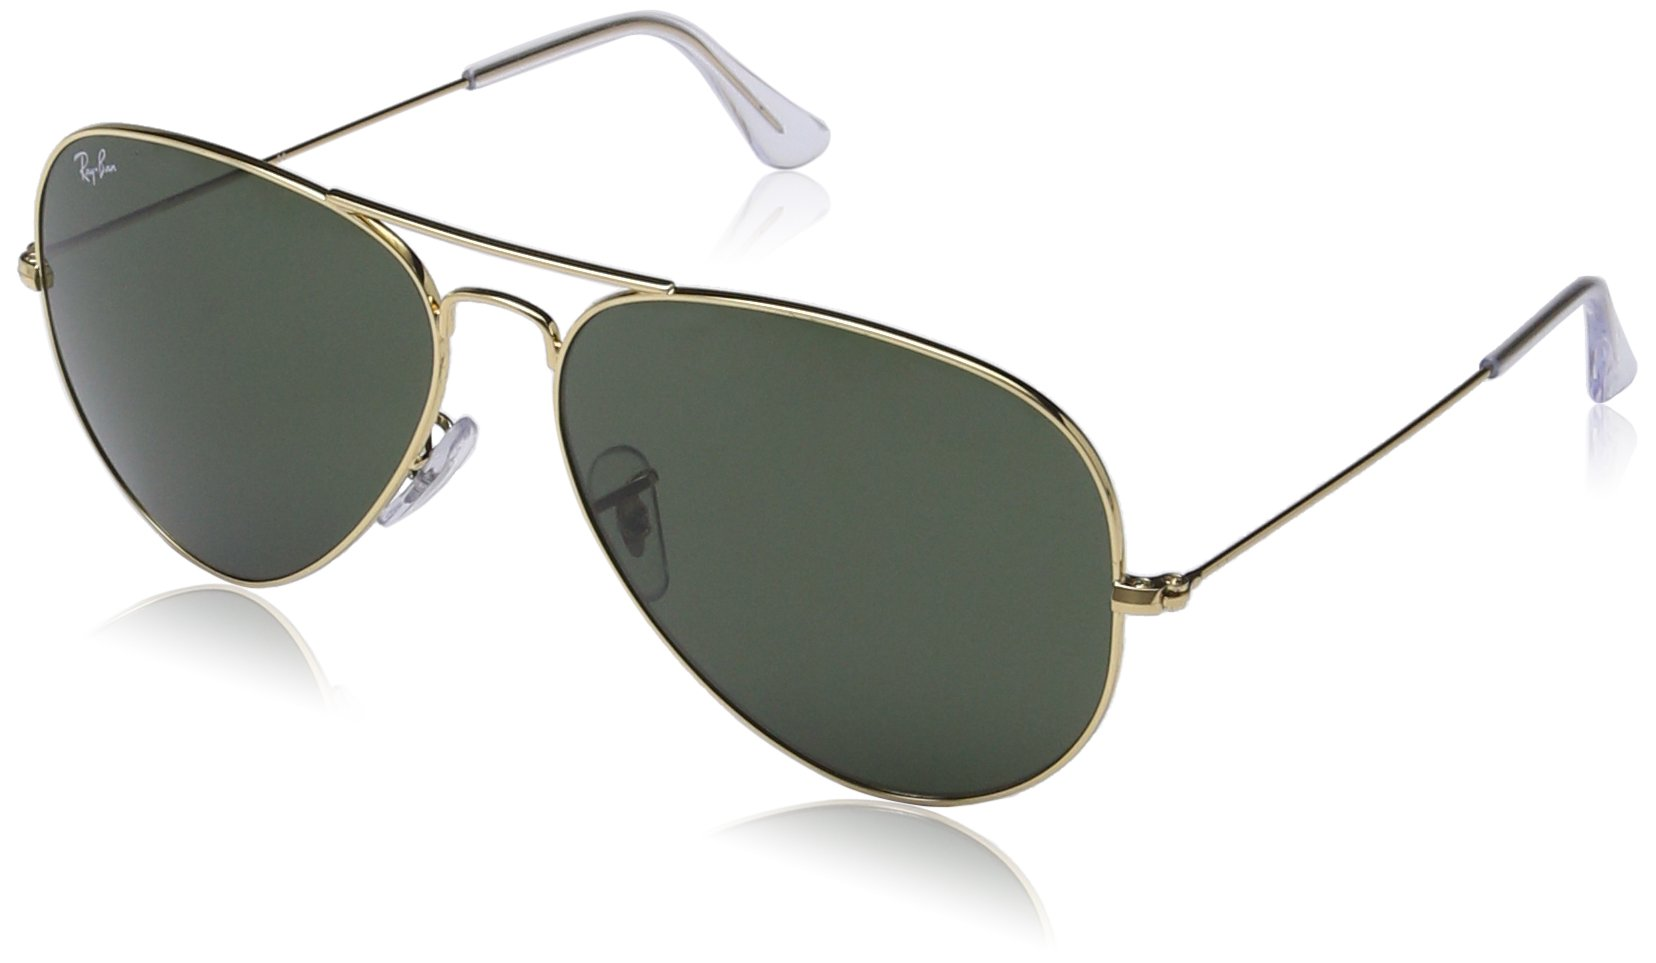 Ray-Ban Large Metal Ii Aviator Sunglasses, Arista, 62 mm